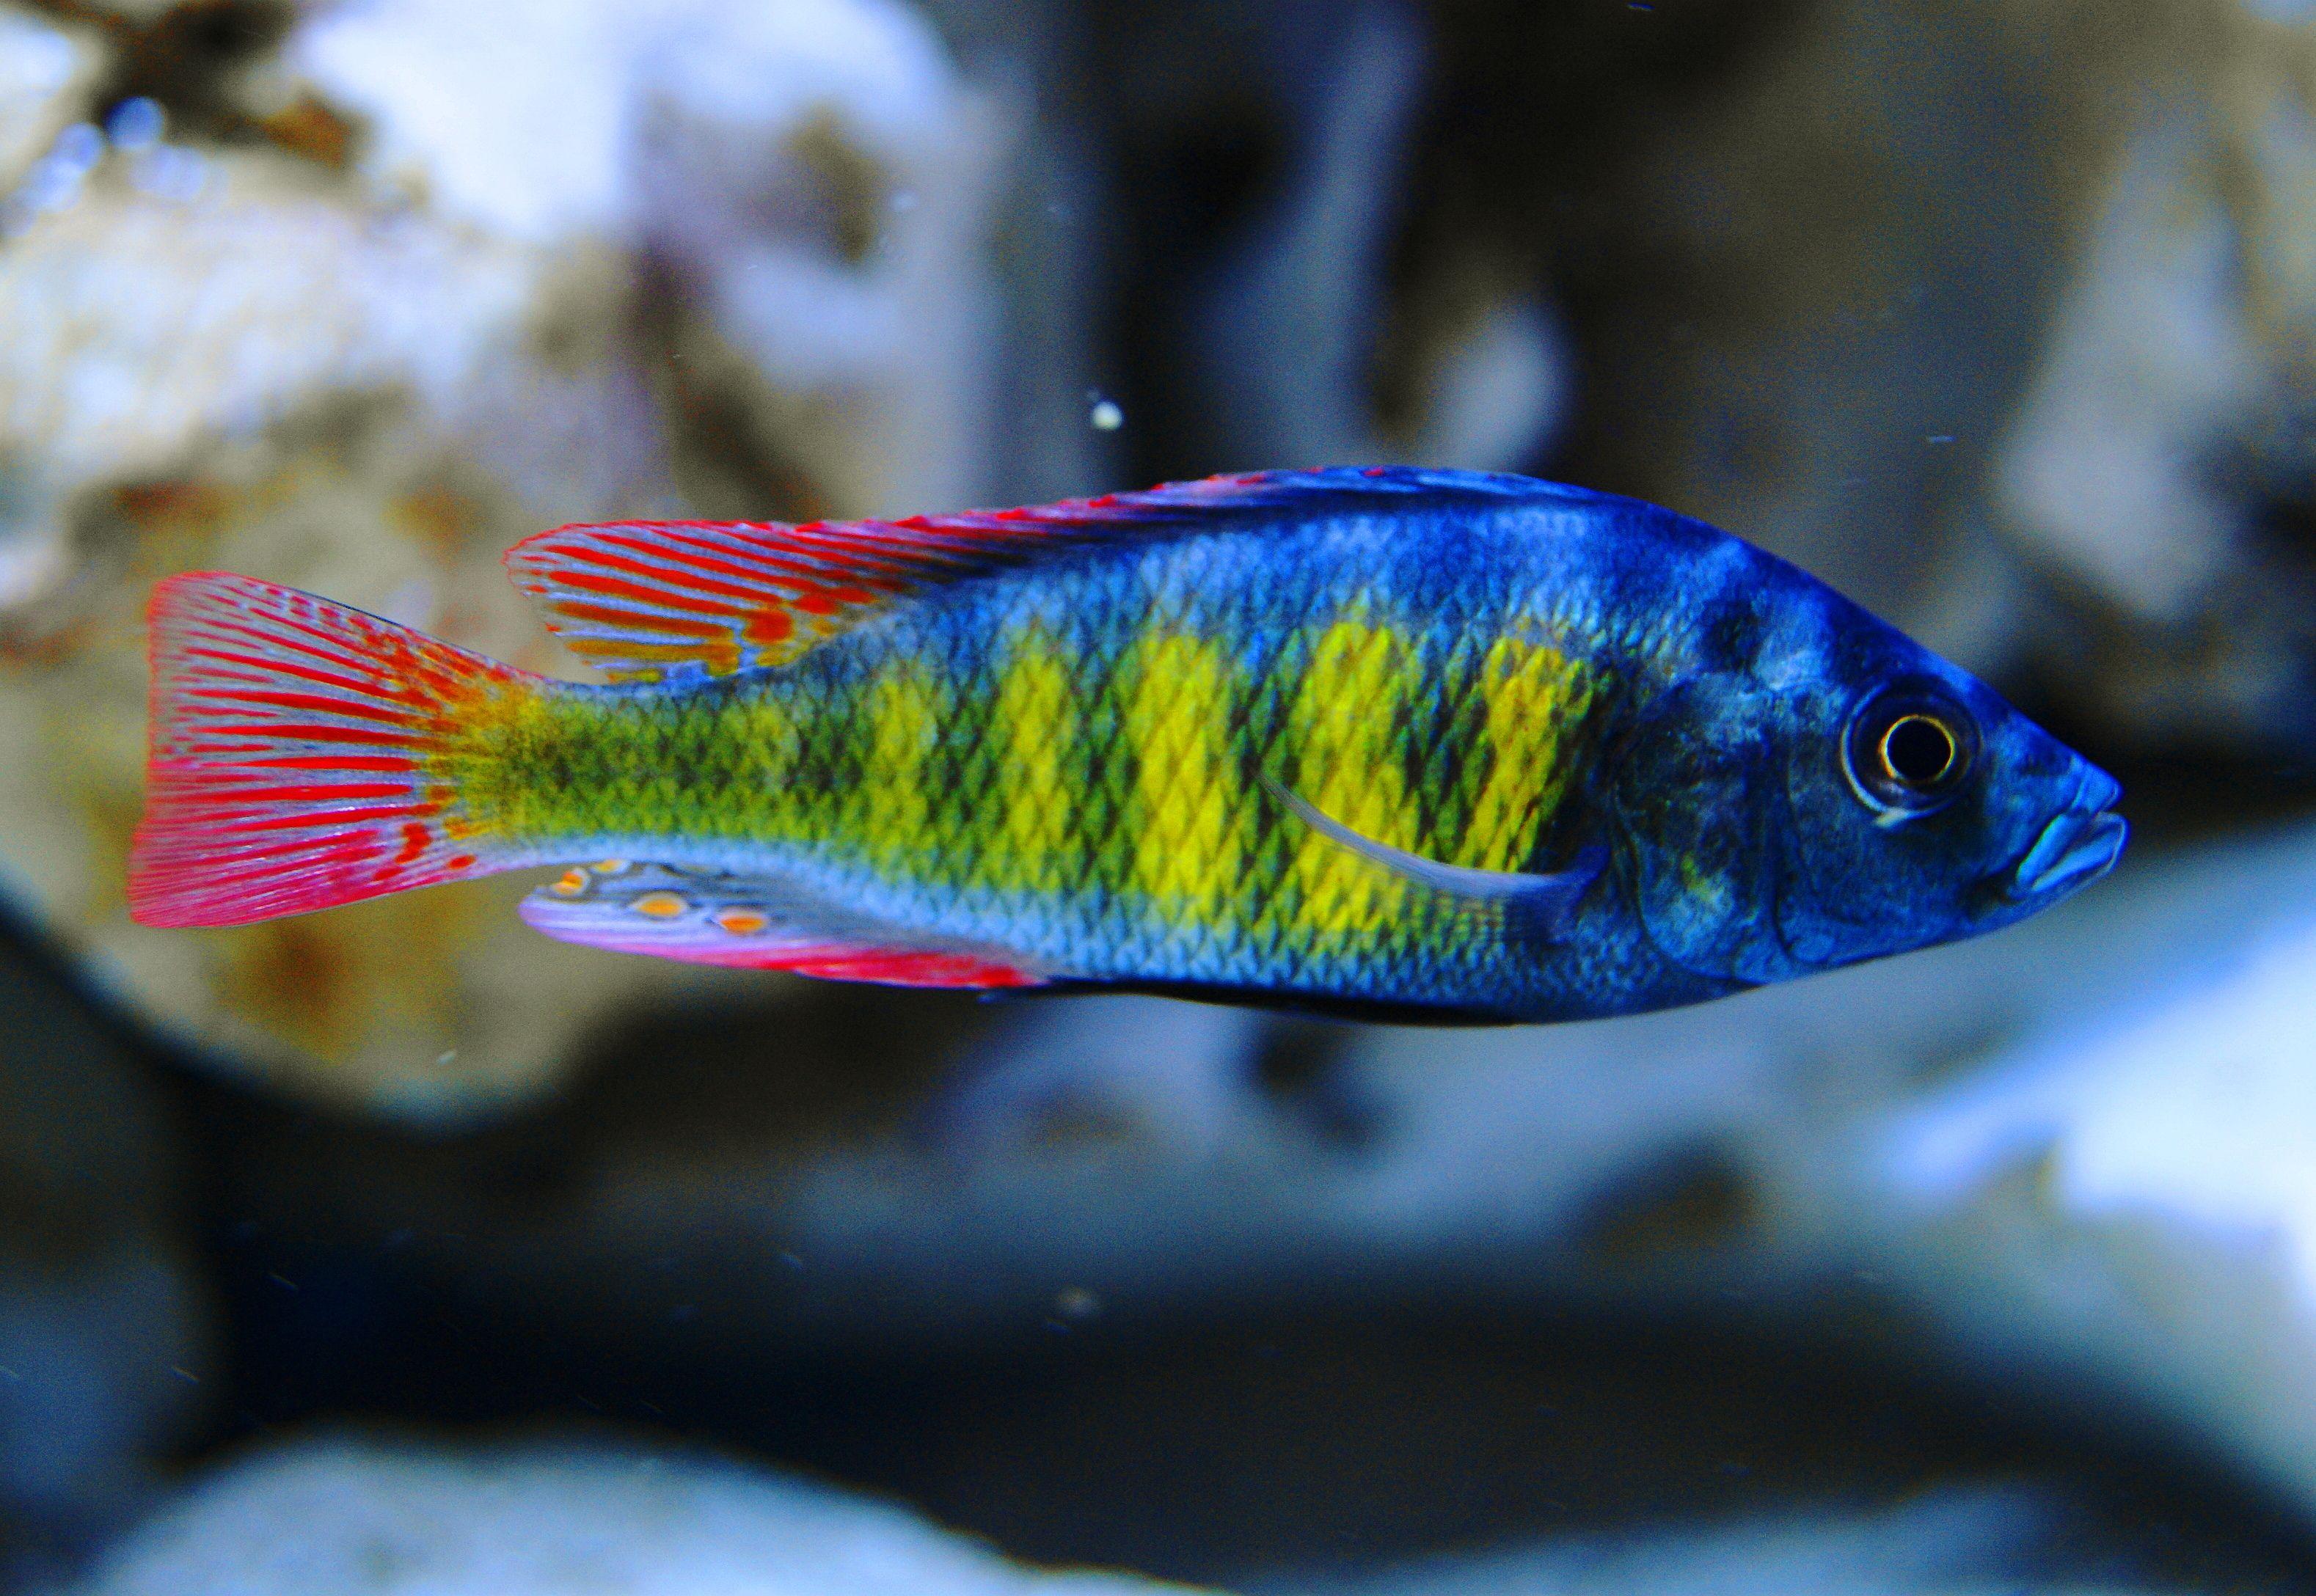 Haplochromis Sp 44 Obliquidens Haplochromis Thick Skin Pet Fish Freshwater Fish African Cichlids